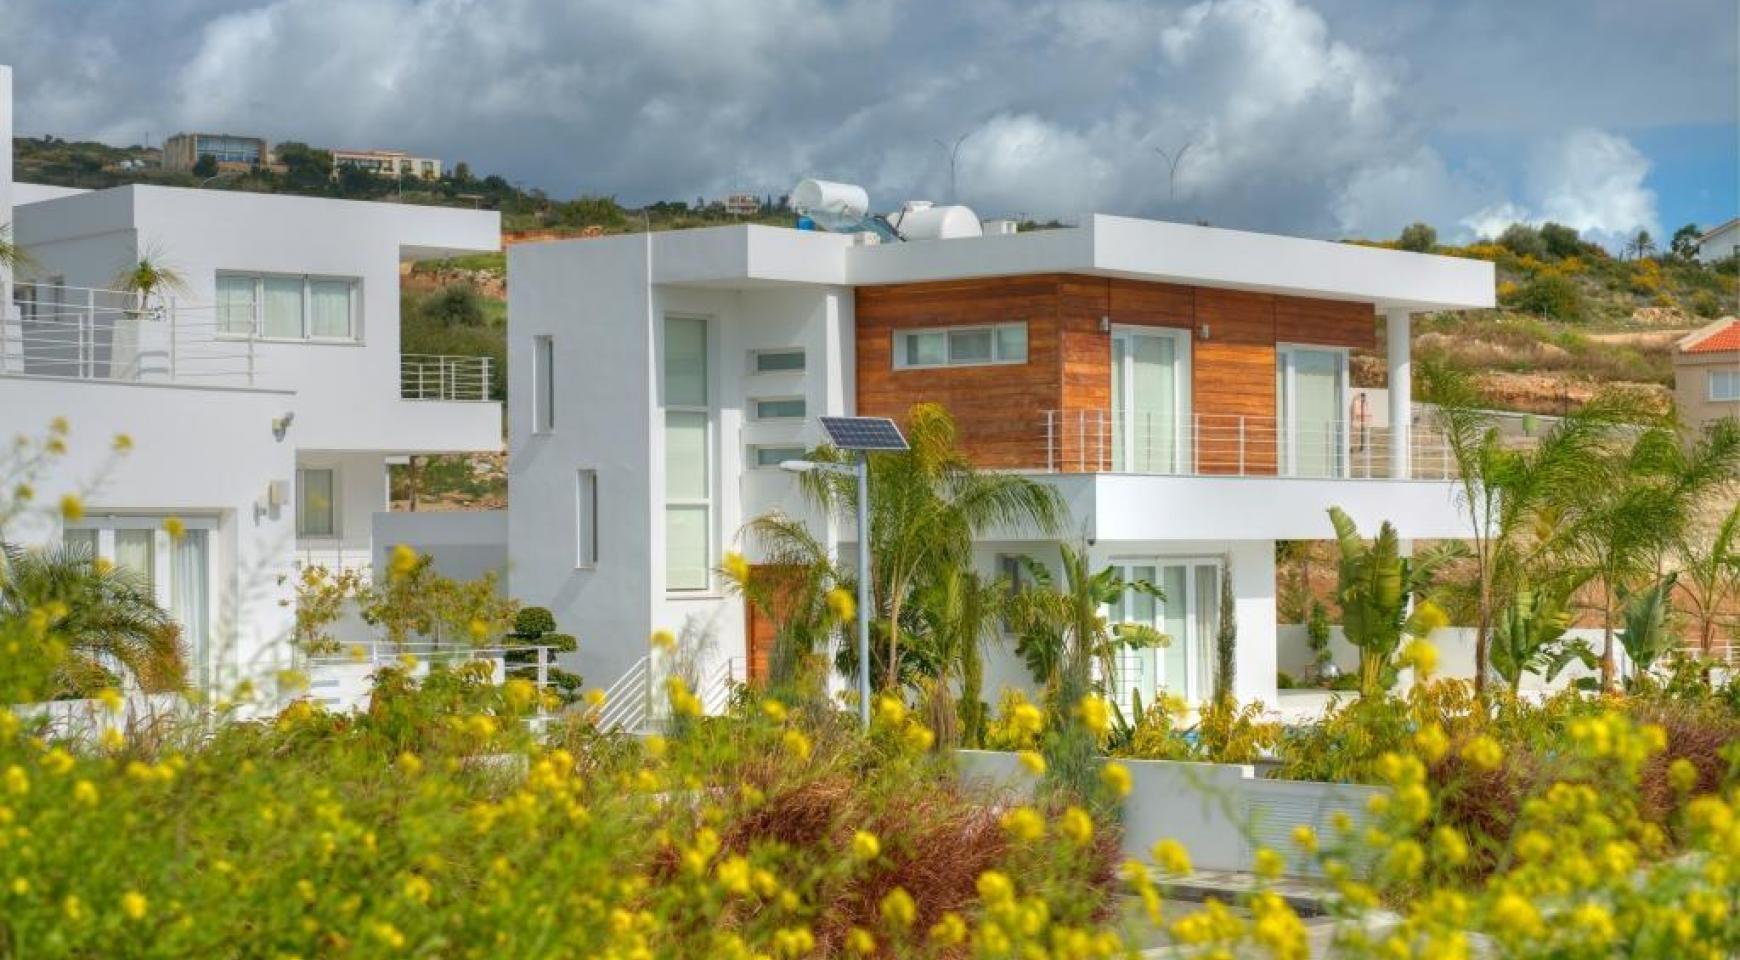 4-Спальная Вилла с Видом на Море в Районе Agios Tychonas - 7